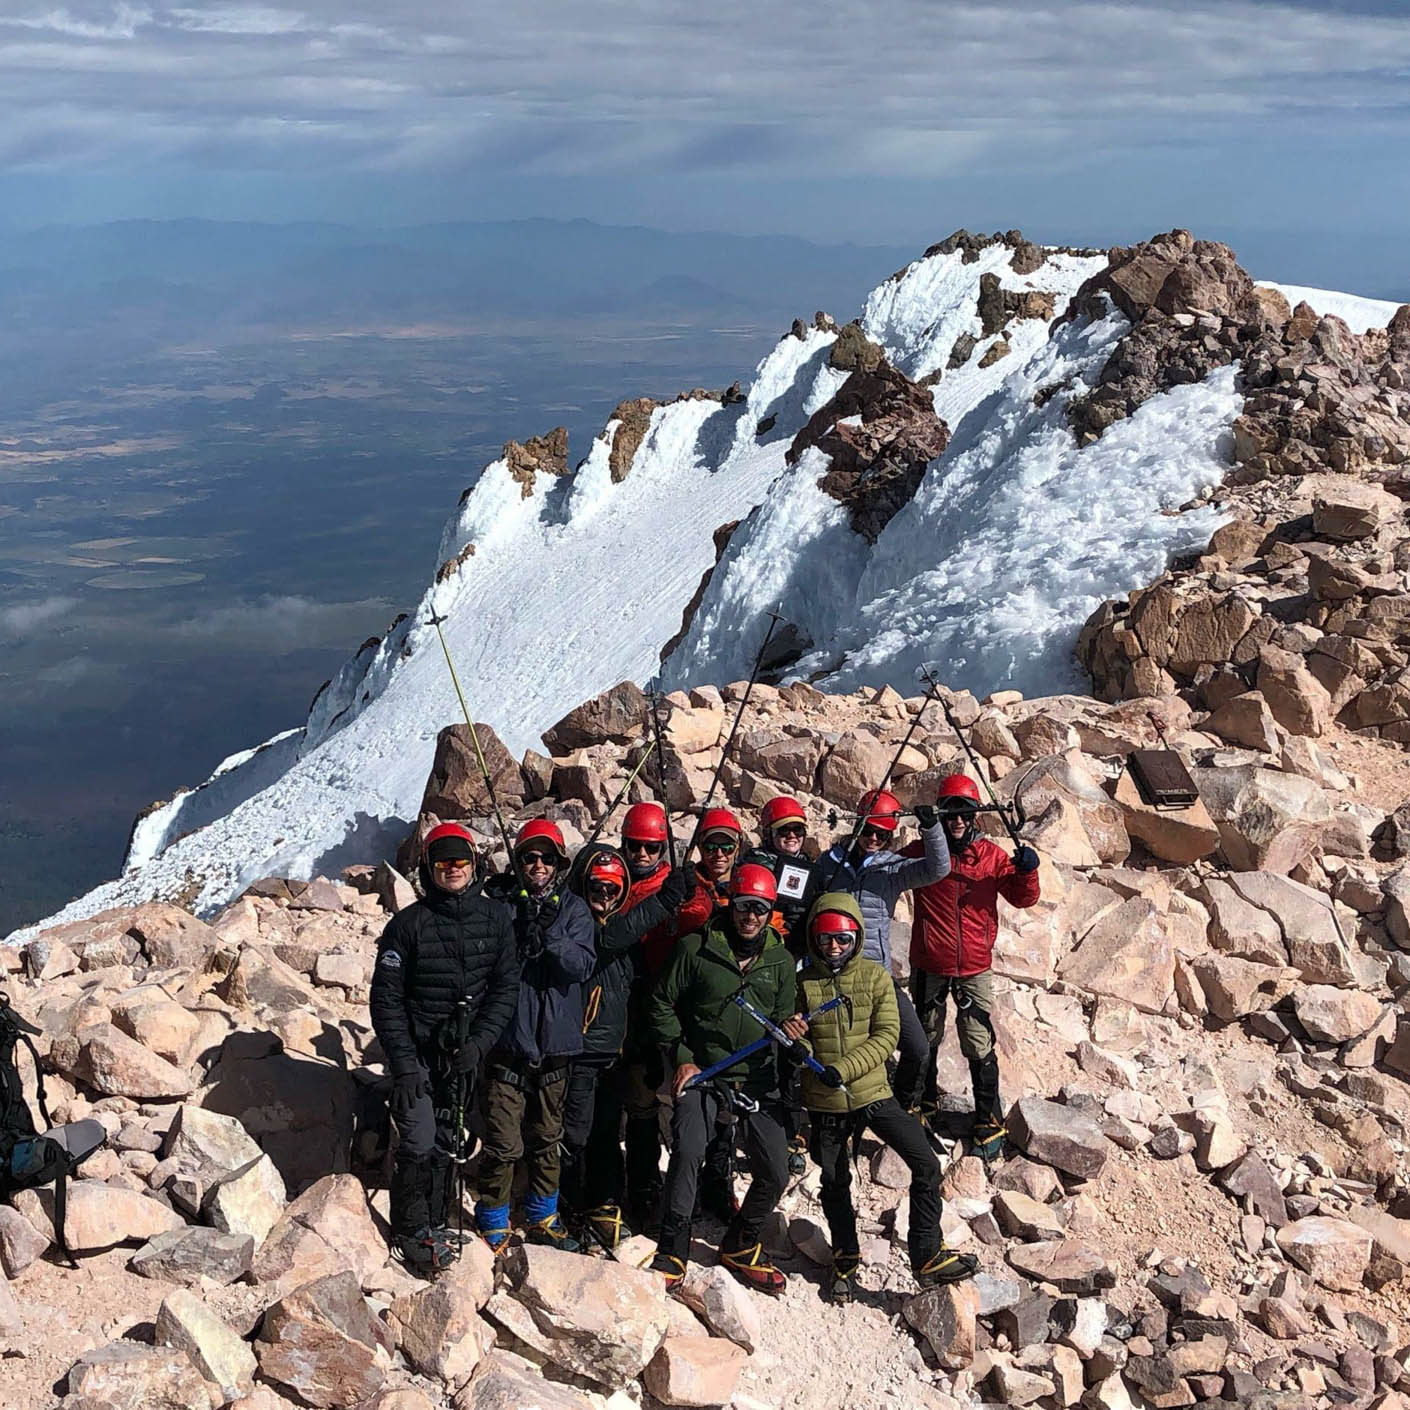 High Sierra mountaineer